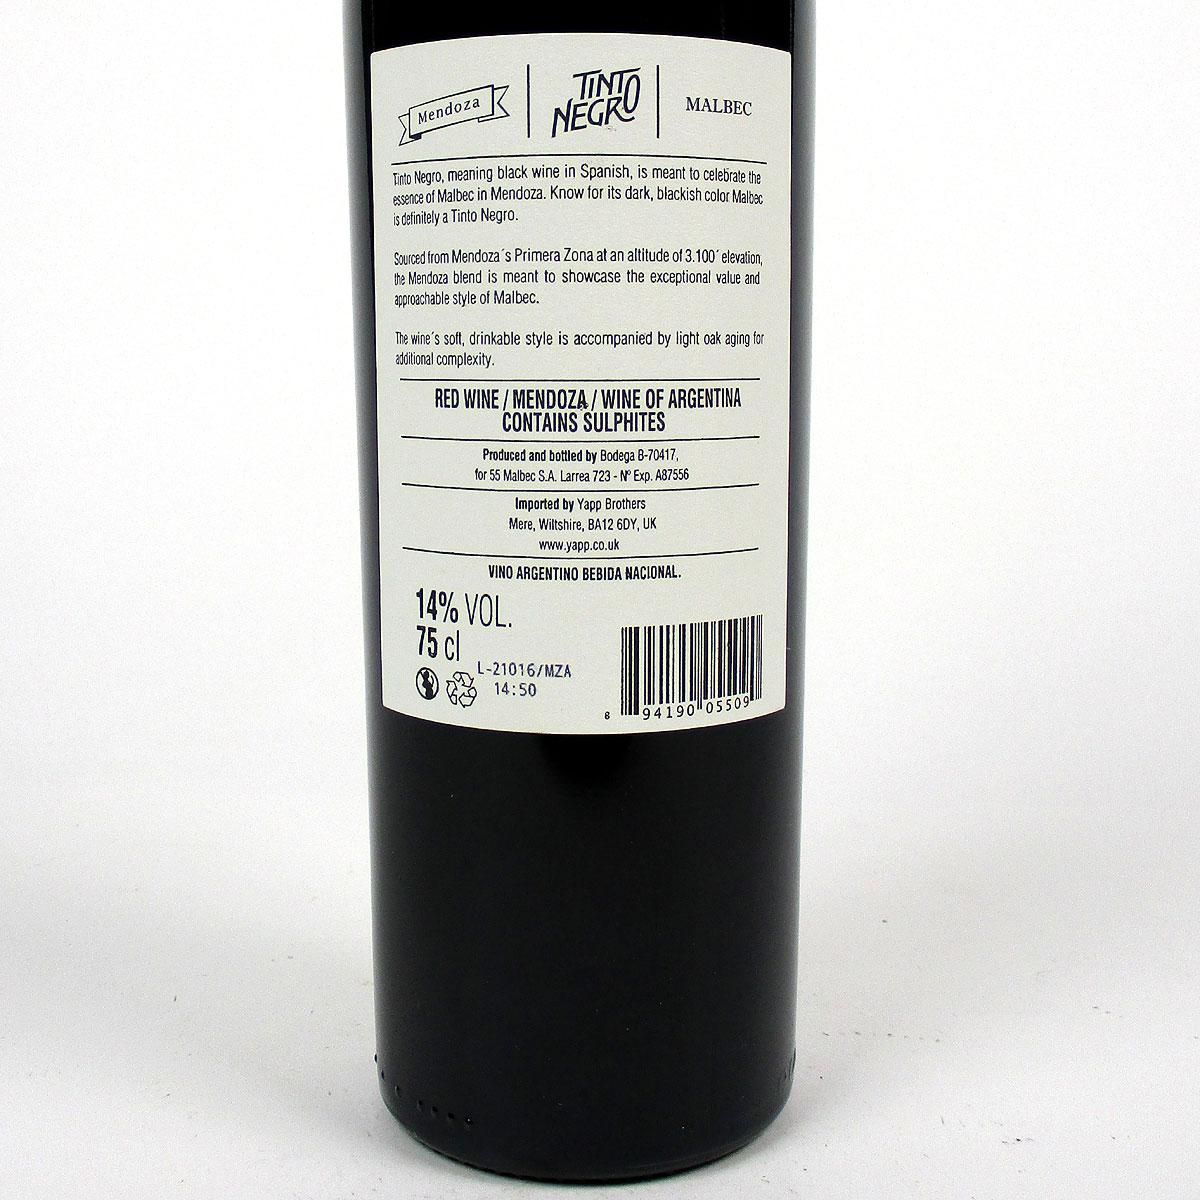 Tinto Negro: Mendoza Malbec 2019 - Bottle Rear Label